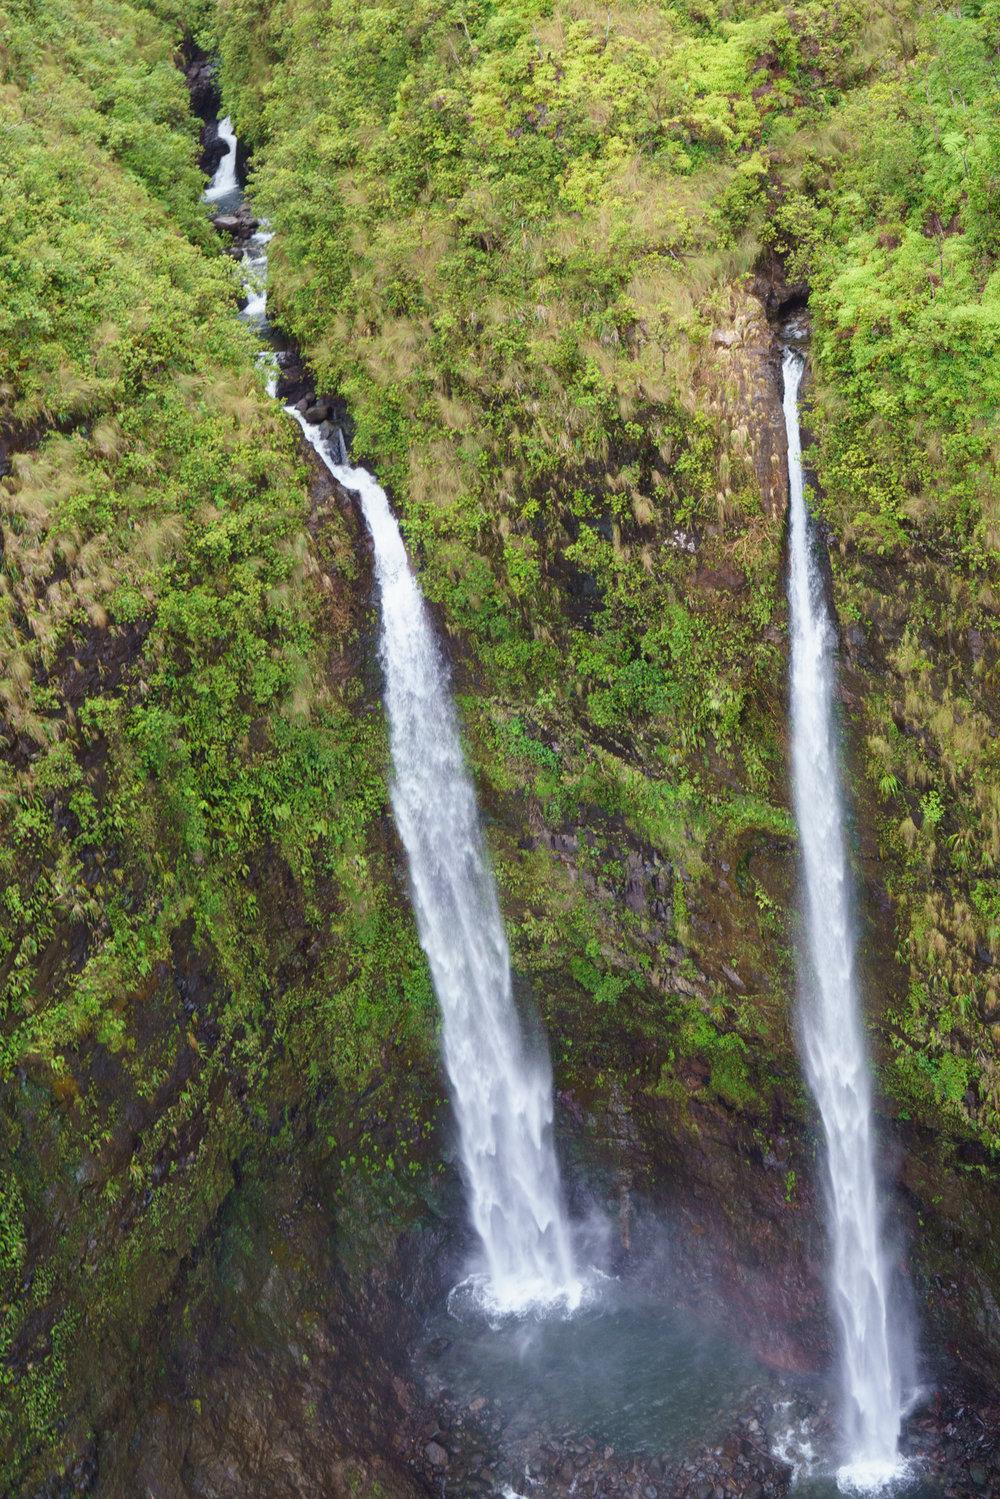 No shortage of waterfalls in Kauai